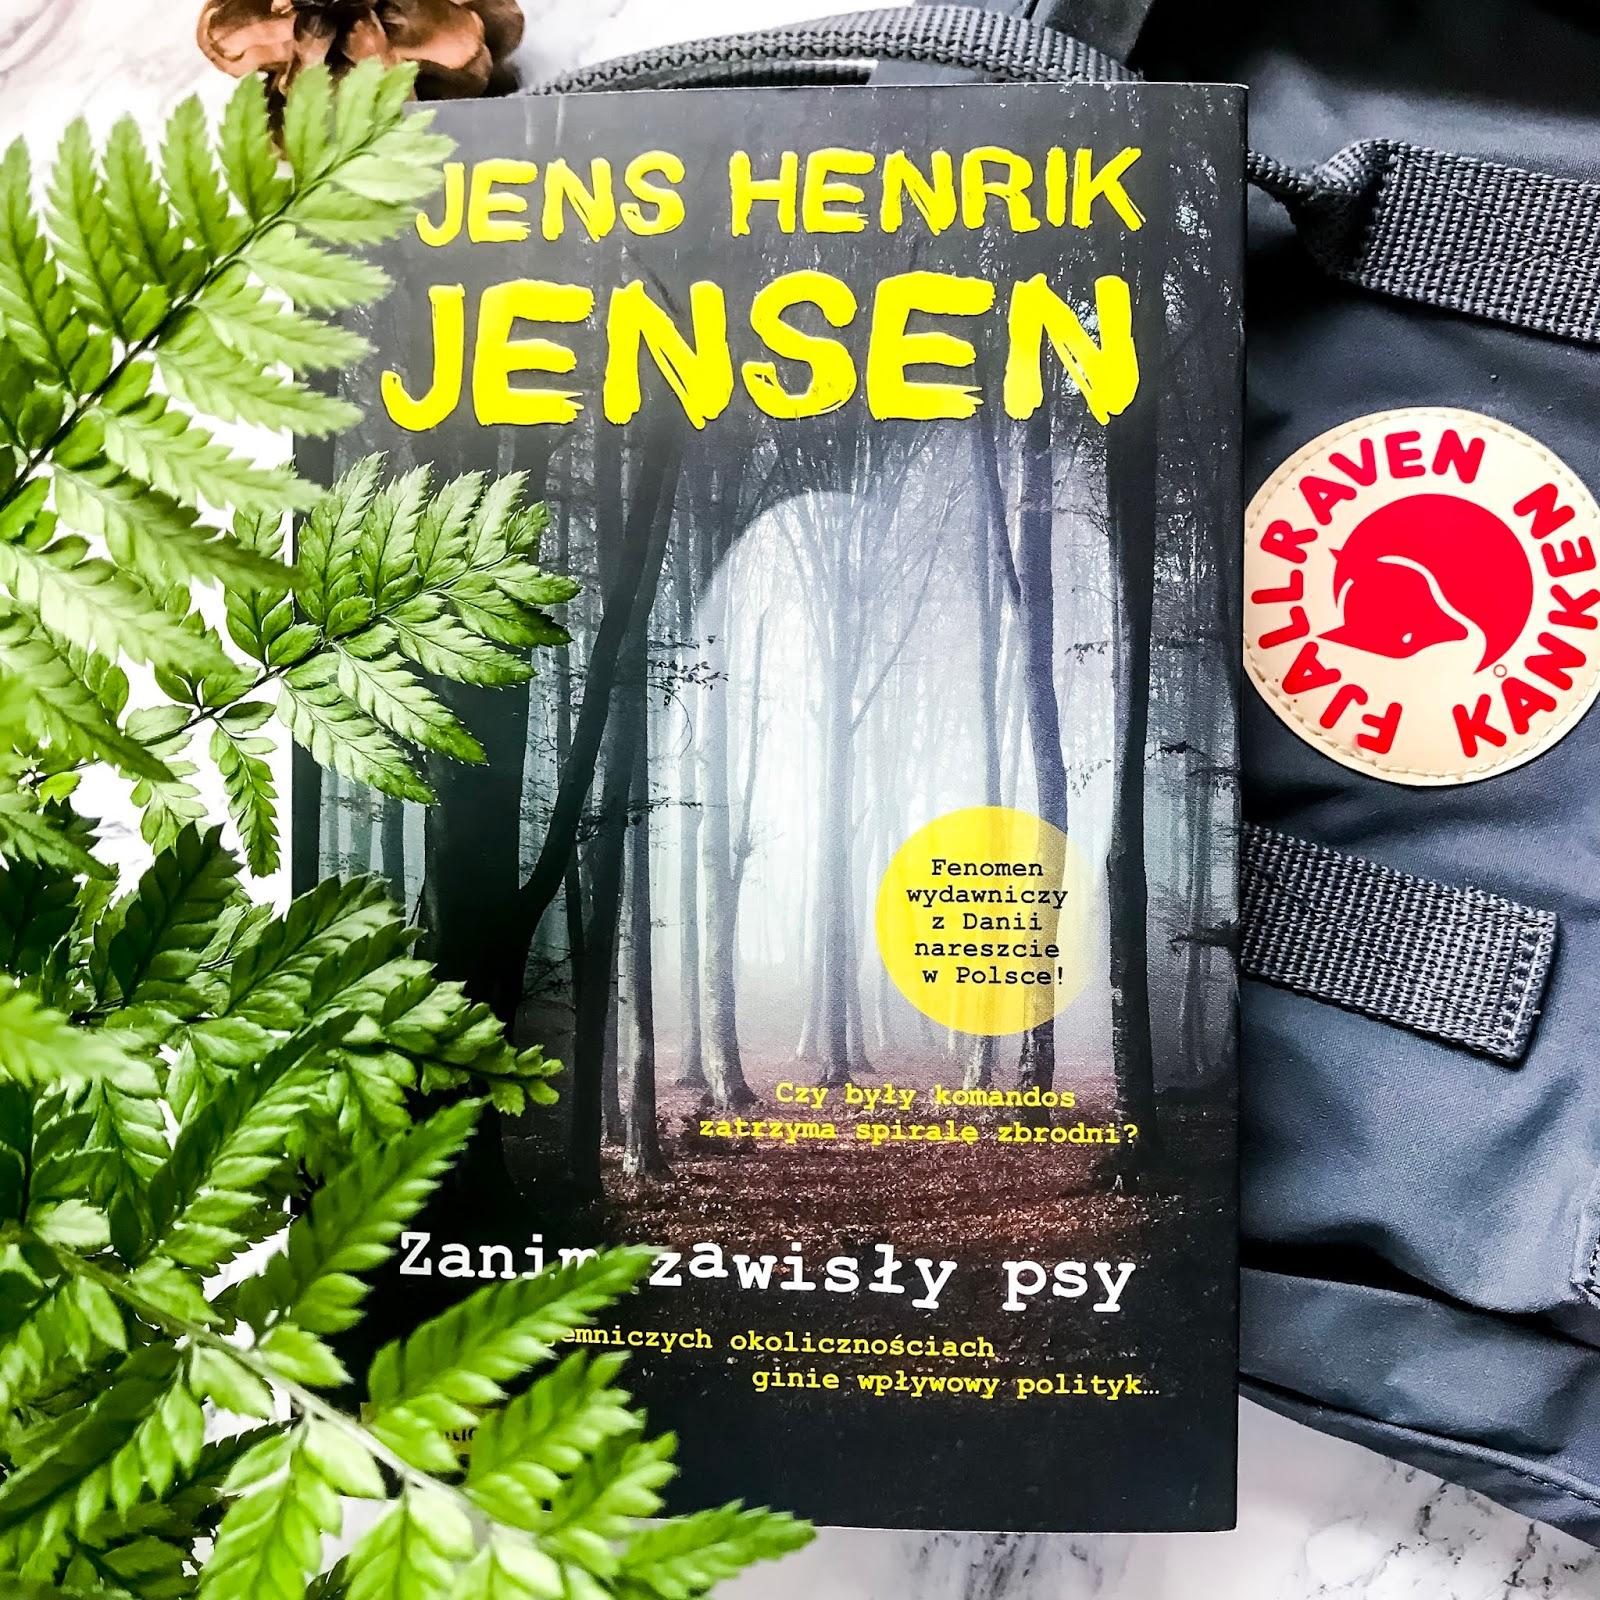 "Jens Henrik Jensen - ""Zanim zawisły psy"" - trylogia Oxen. Czy Niels Oxen to duński Jack Reacher?"